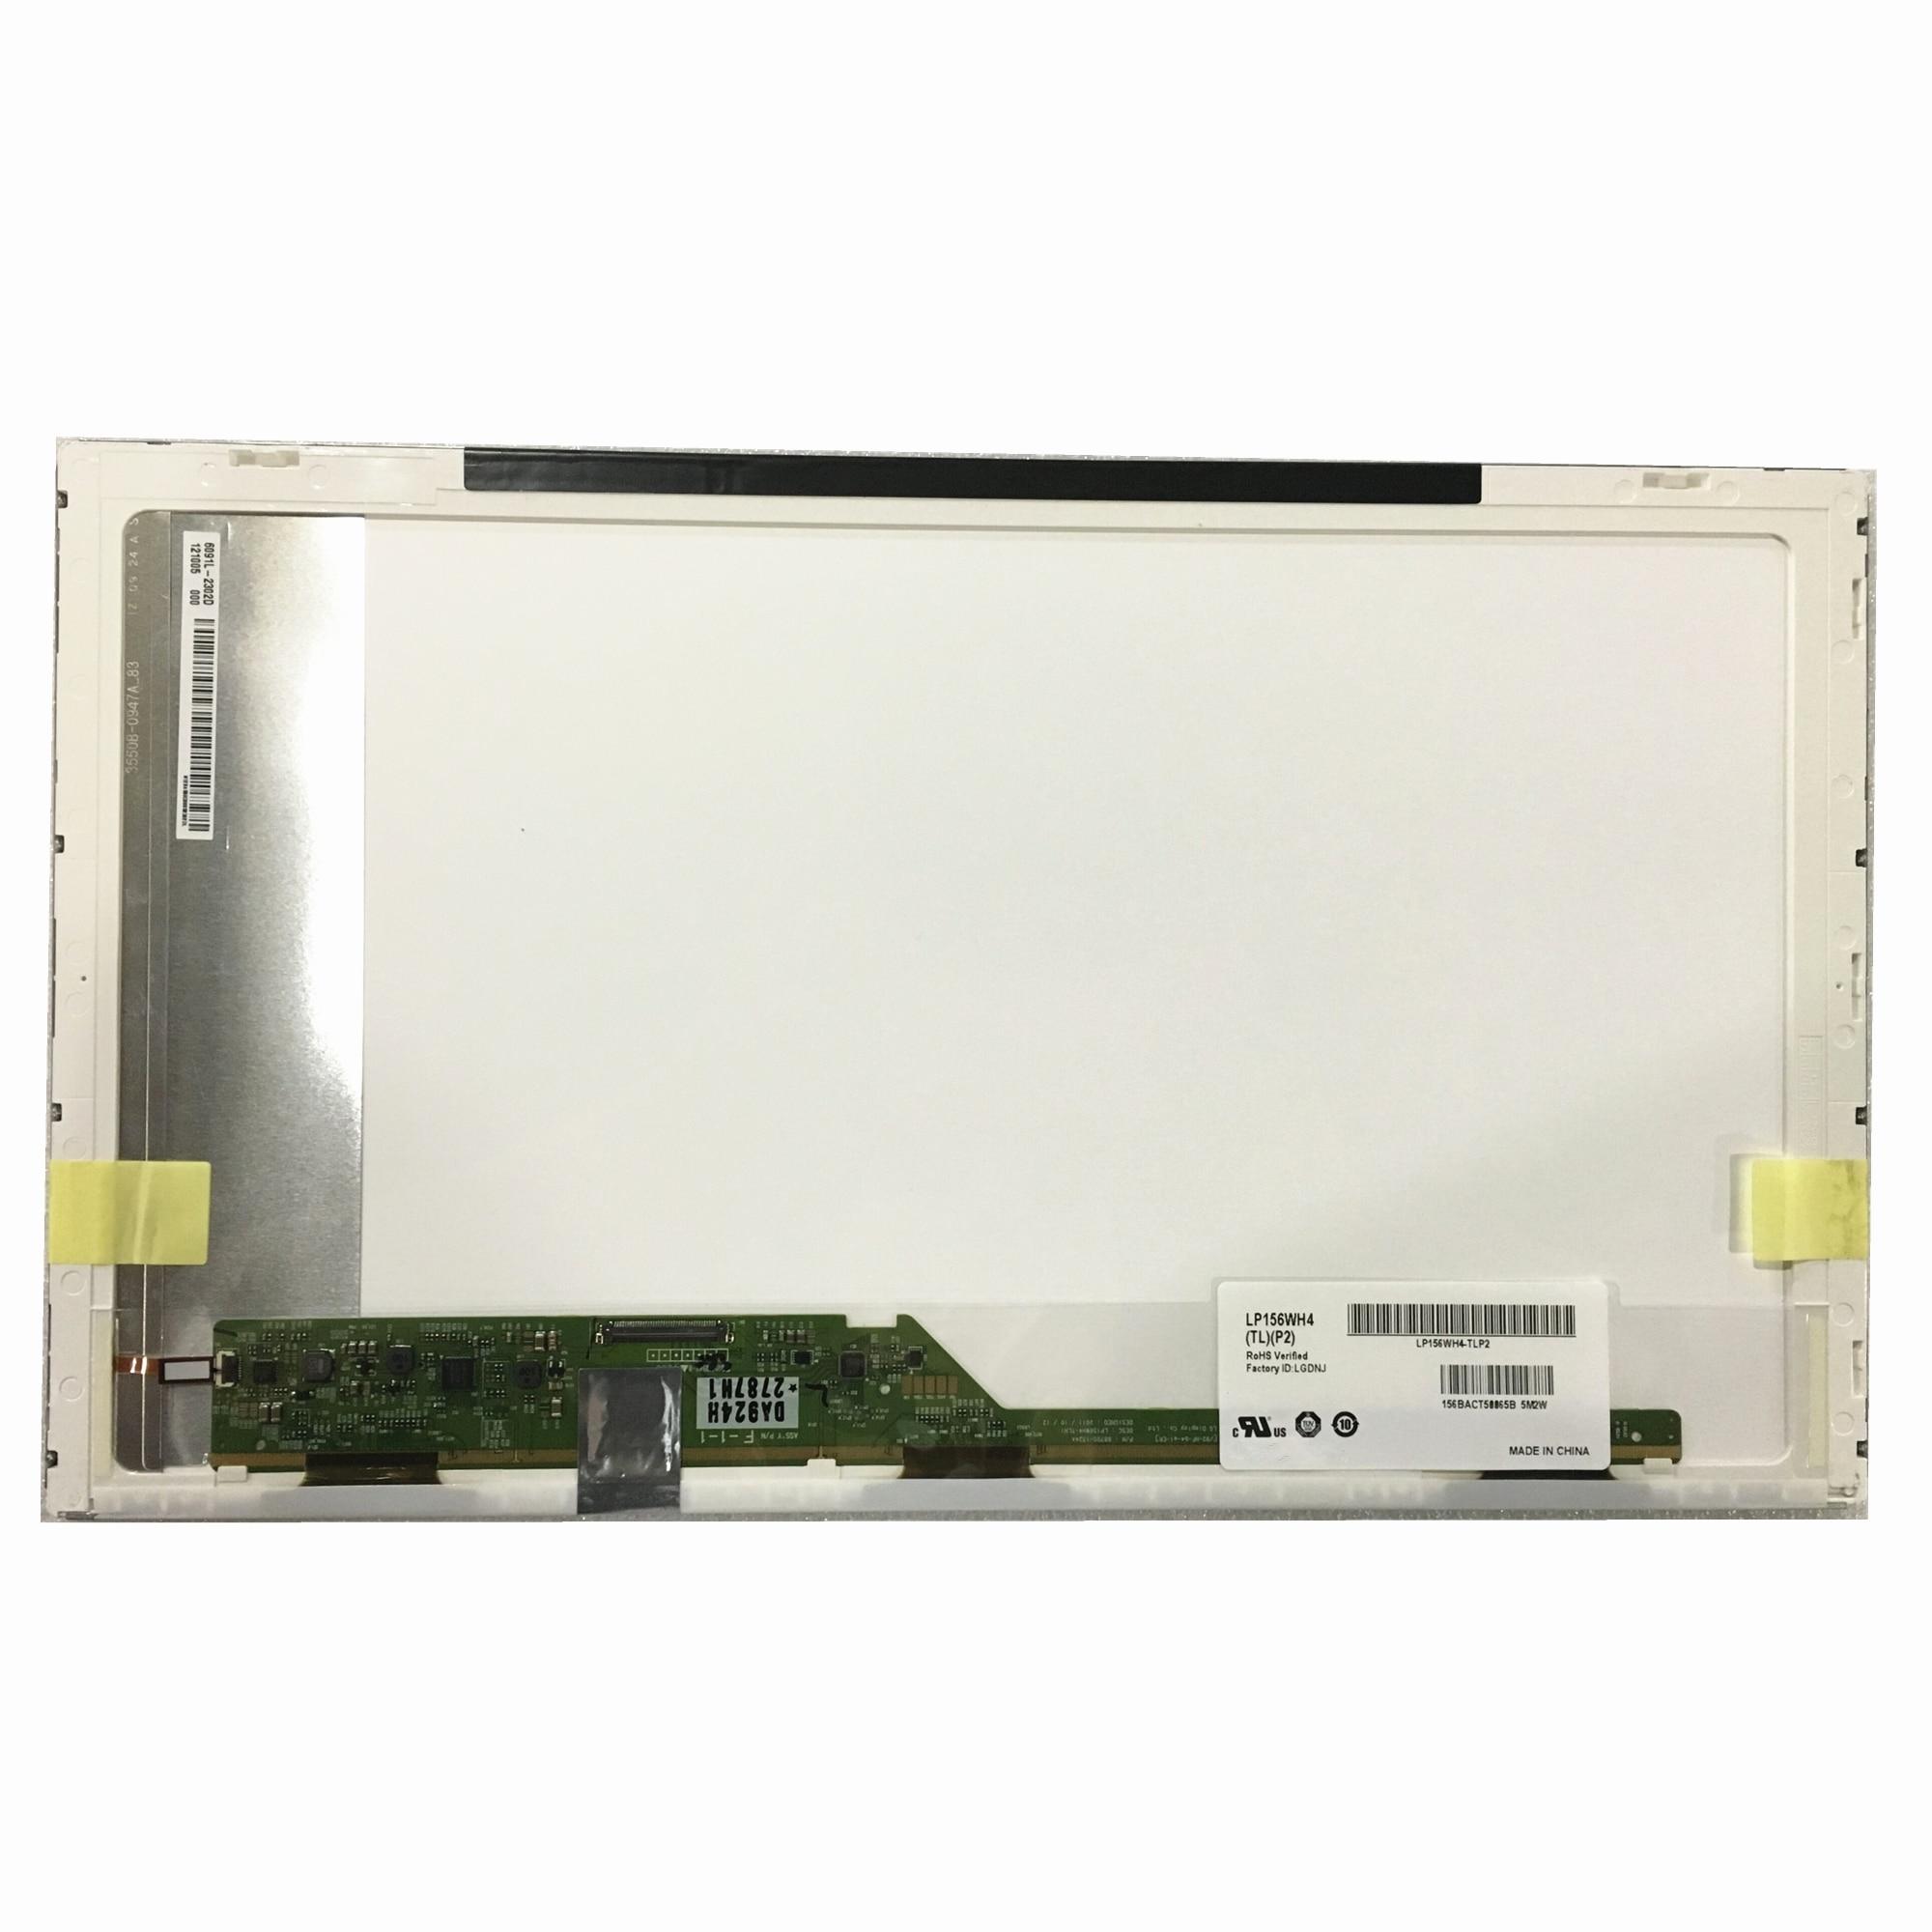 Envío Gratis LP156WH4-TLP2 LP156WH4 TLP2 TLP1 LP156WH4 TLN2 B156XW02 LP156WH2 pantalla Lcd de ordenador portátil 1366*768 40 pines